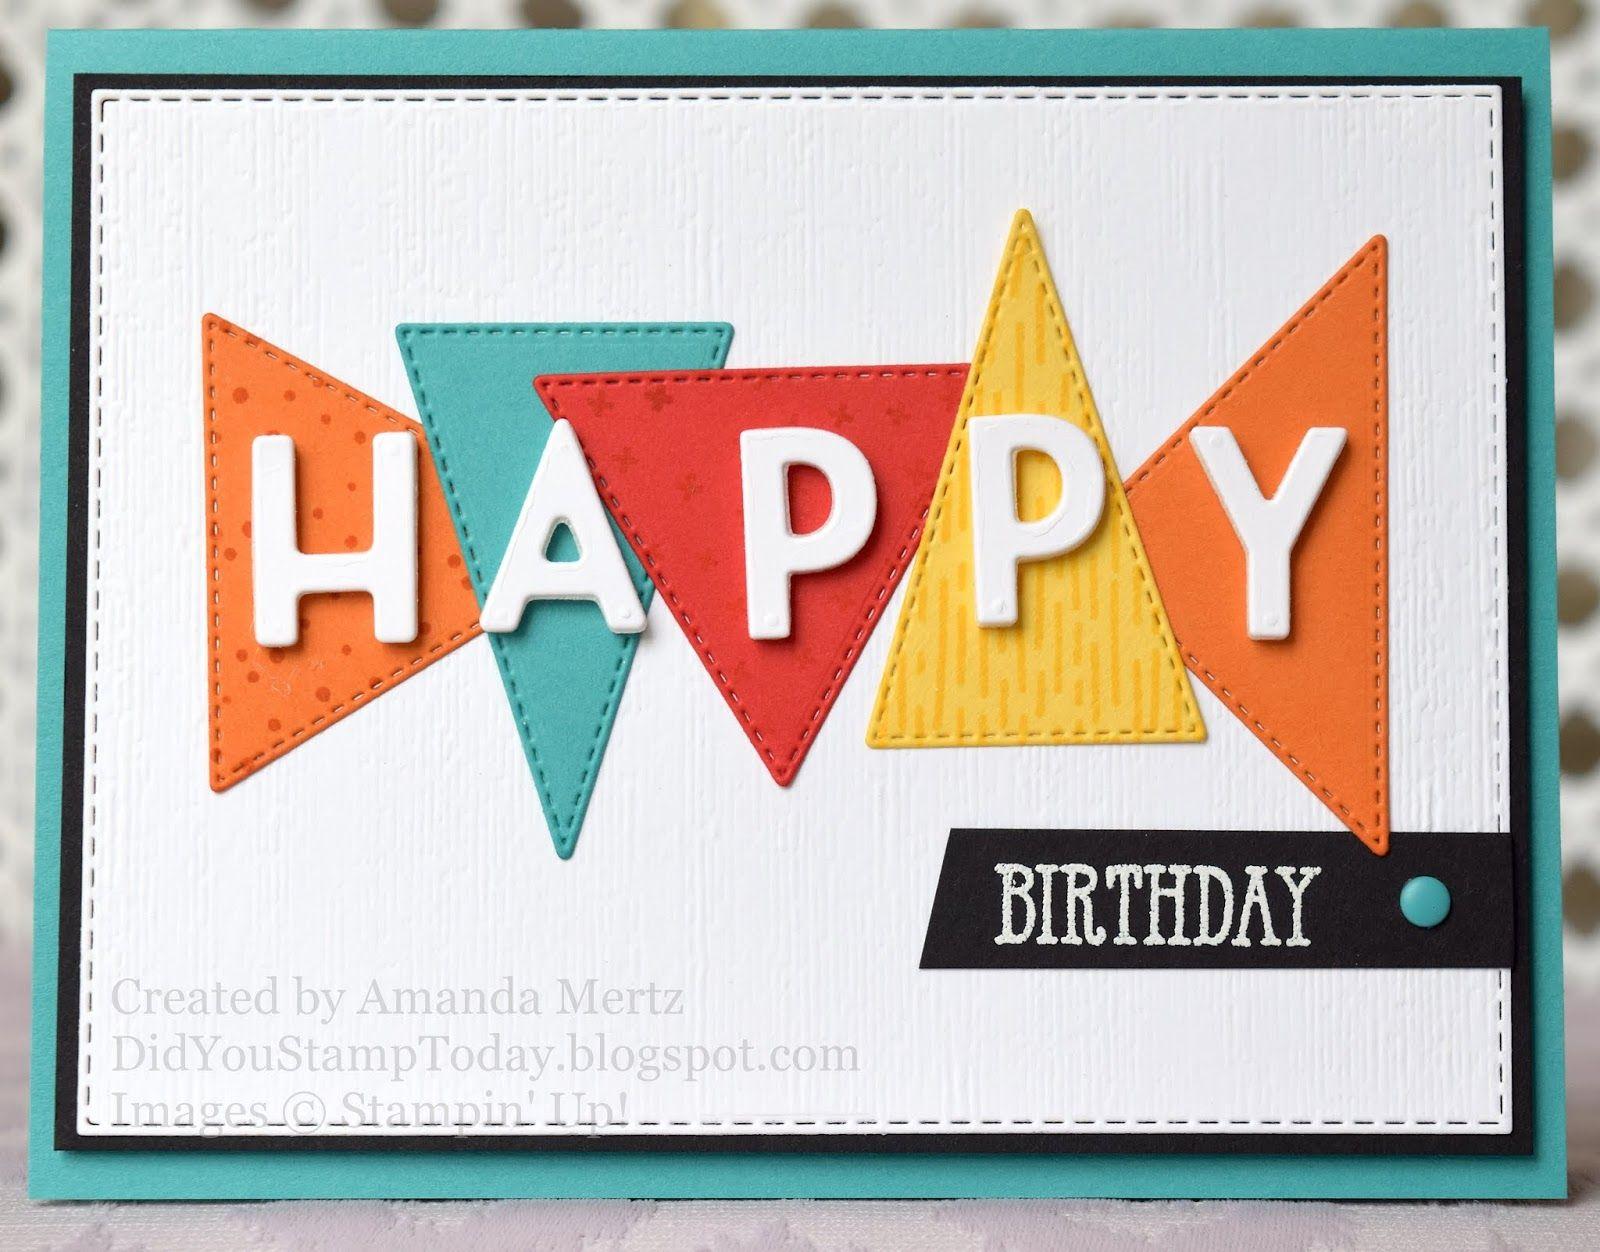 Bright Boy Birthday Stampin Up The Right Triangle Birthday Cards For Boys Stampin Up Birthday Cards Kids Birthday Cards